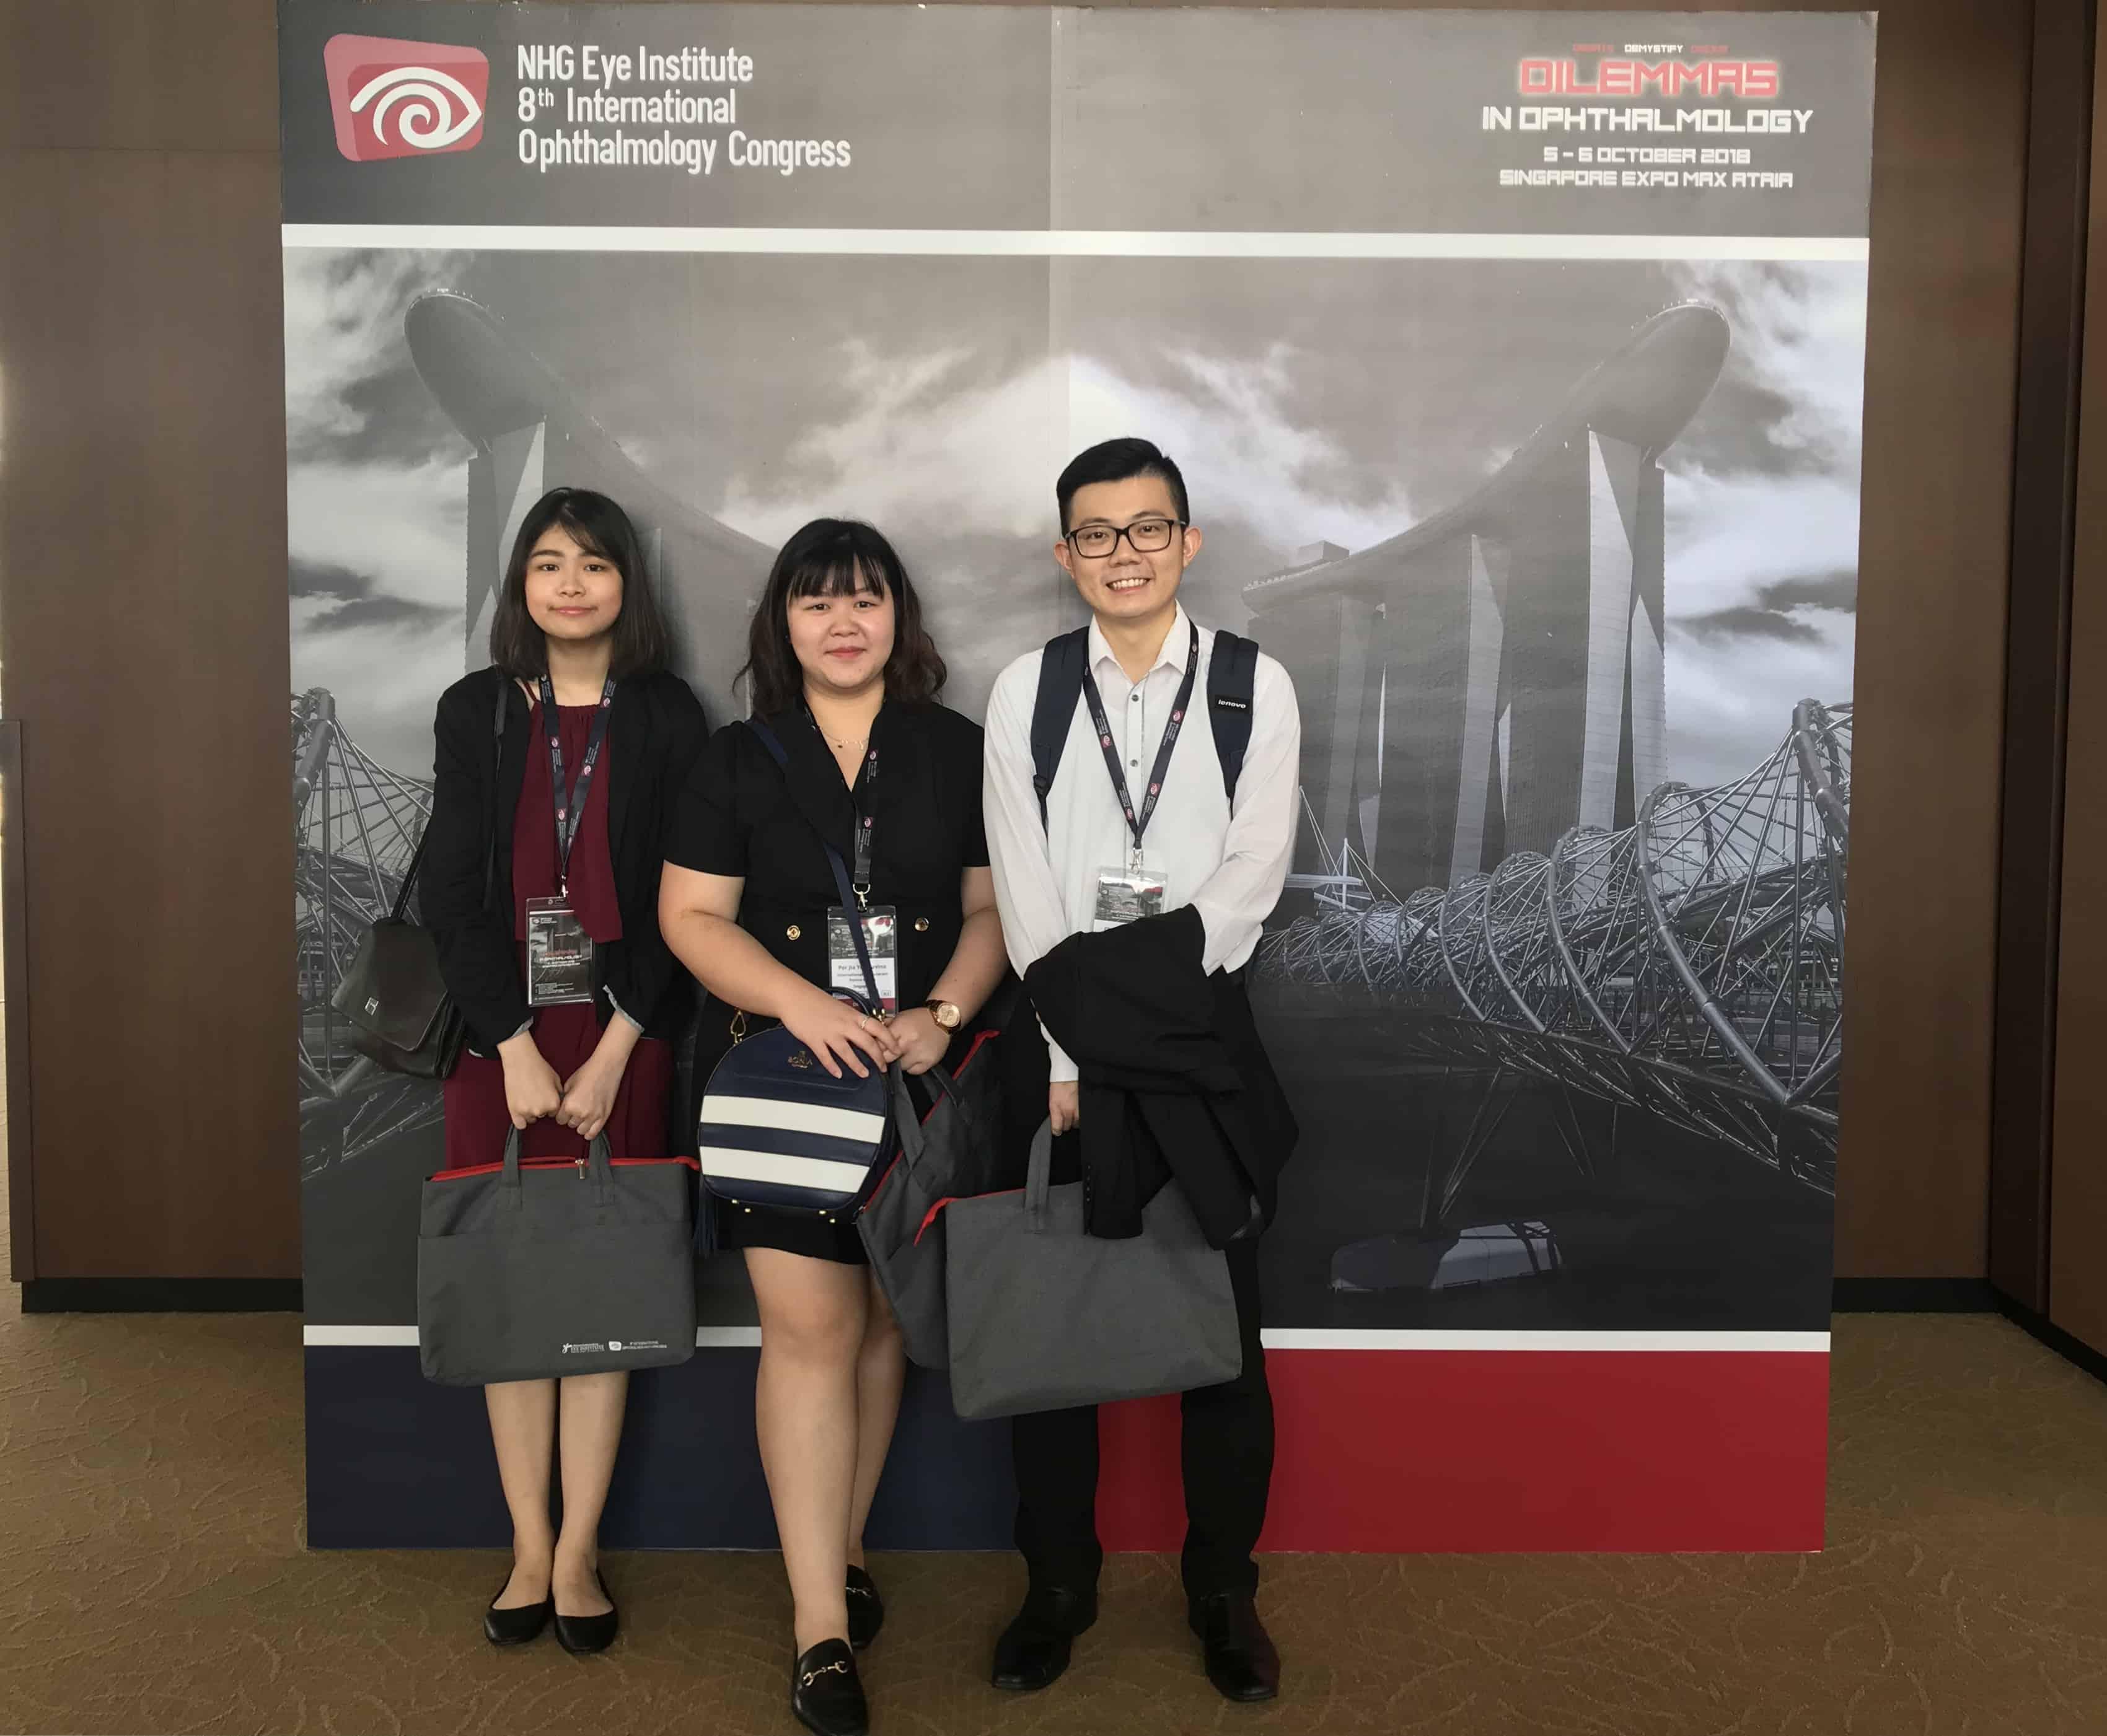 International Eye Cataract Retina Centre optometrists (L-R) Ms Goh Jiah Ying, Ms Por Jia Yee Davina and Mr Chong Wee Hou at the 8th International Ophthalmology Congress in Max Atria, Singapore Expo on 5-6 October 2018